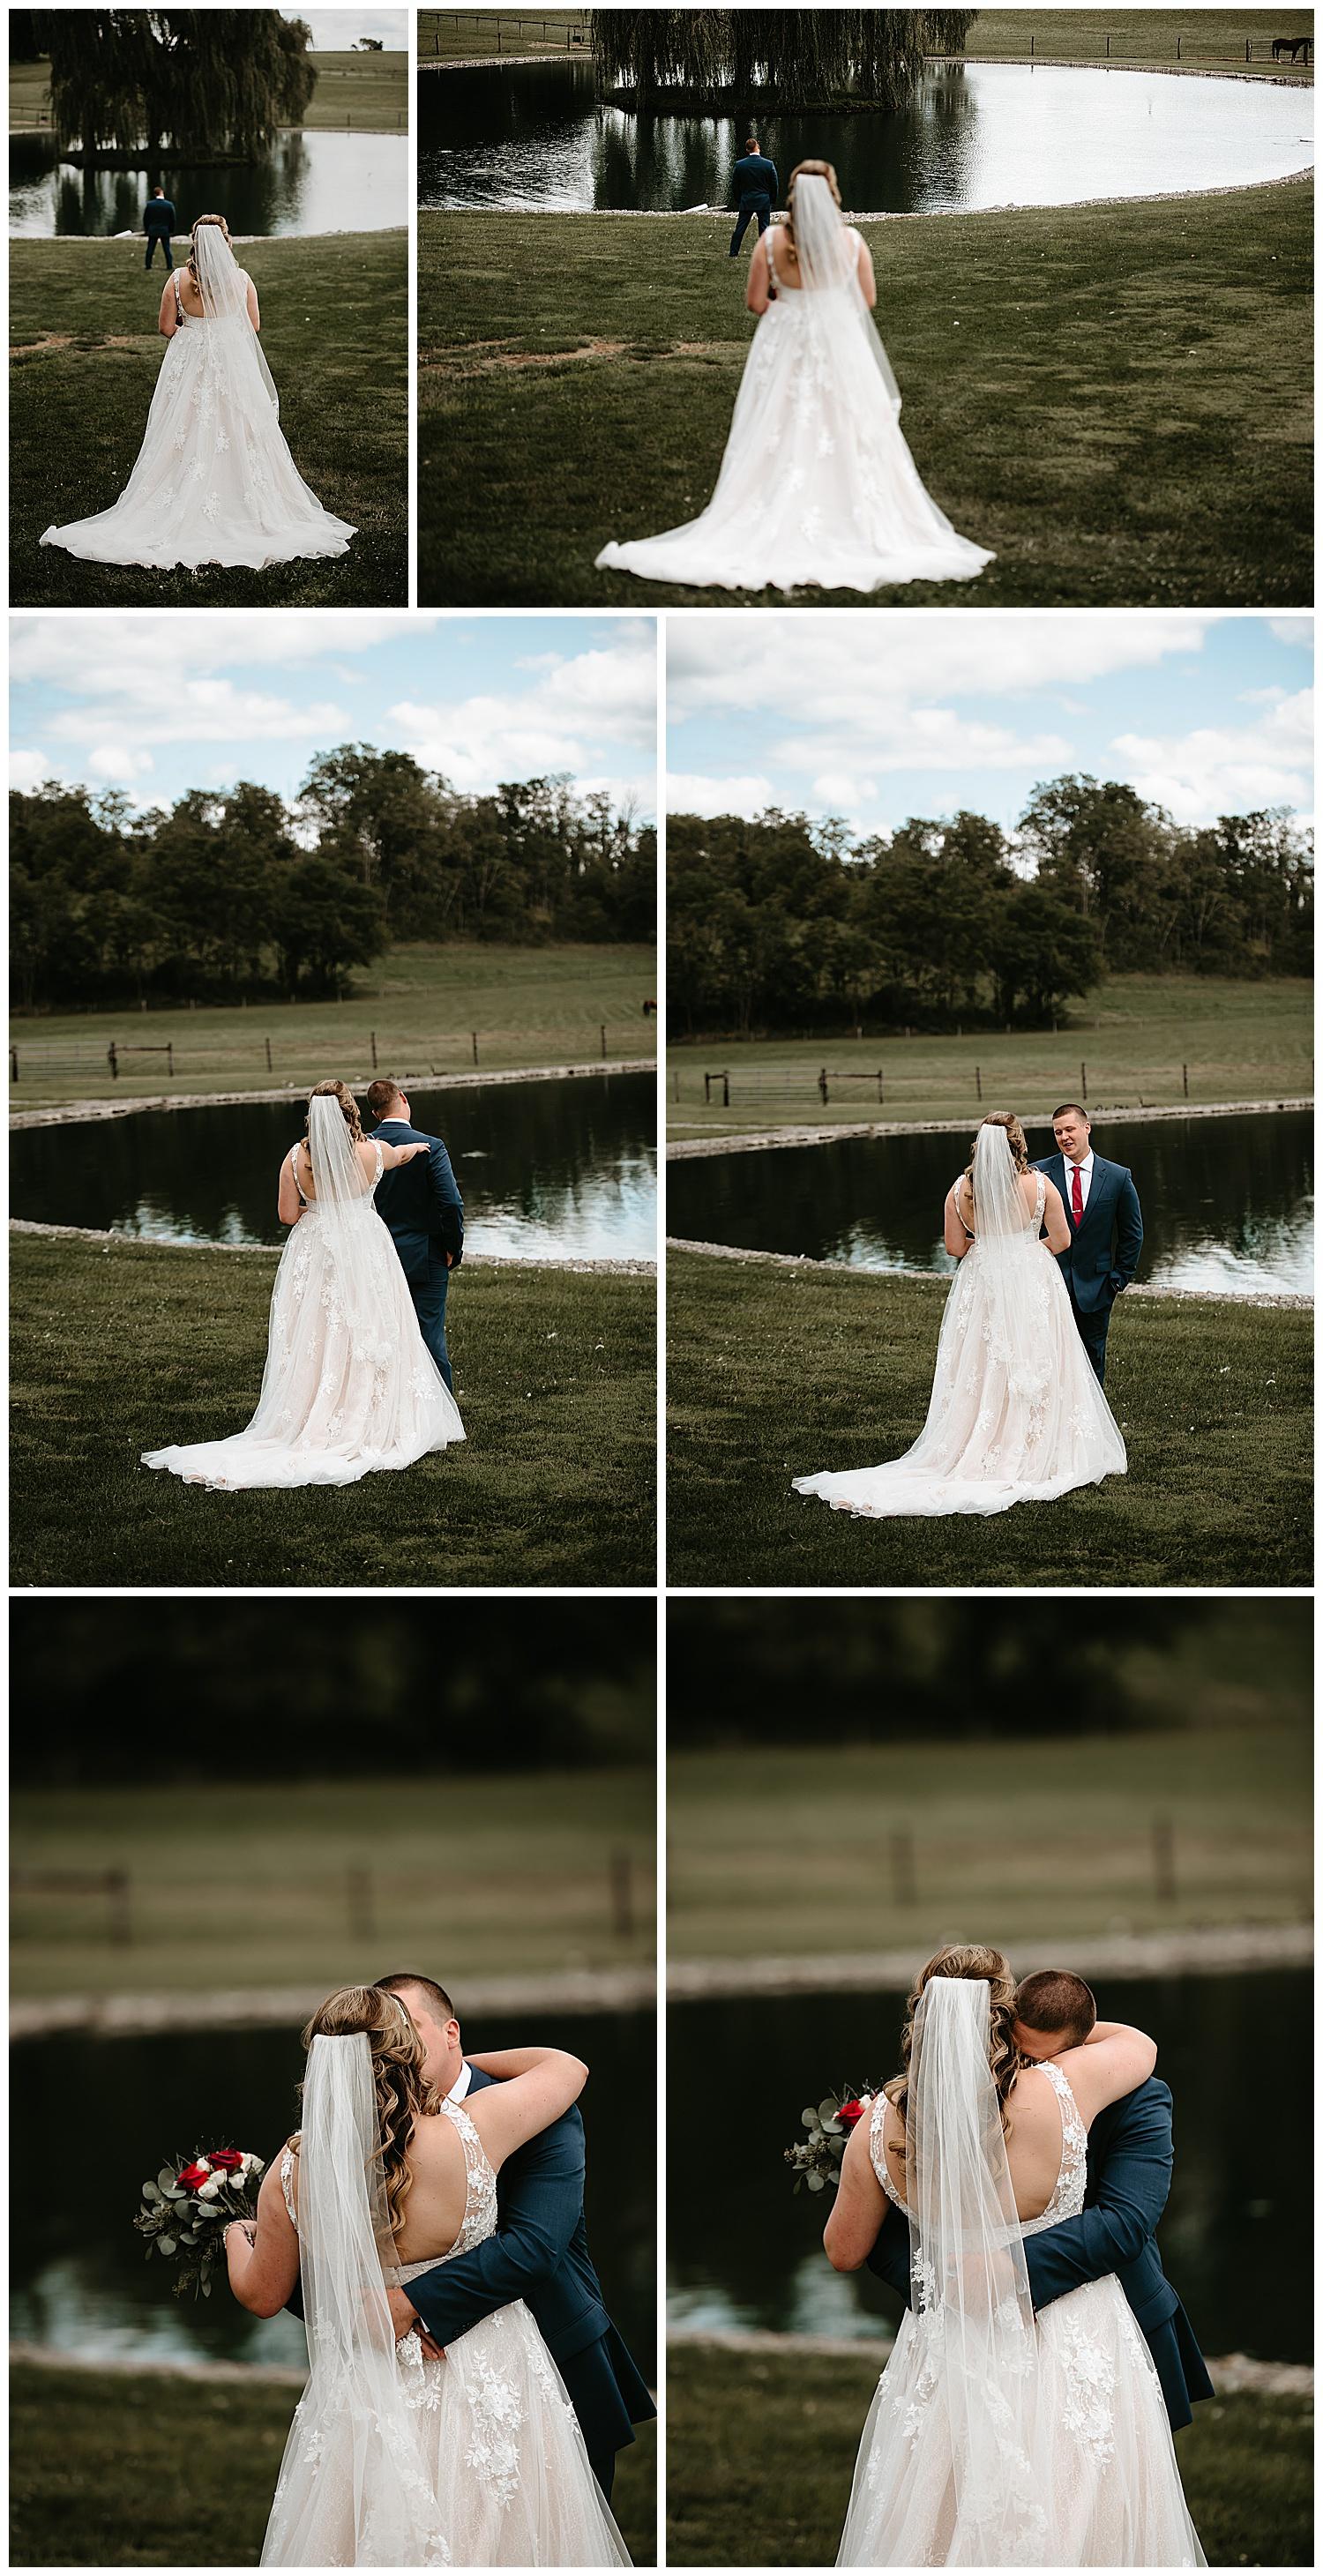 NEPA-Bloomgsburg-Wedding-Photographer-at-The-Barn-at-Greystone-Farms-Watsontown-PA_0024.jpg